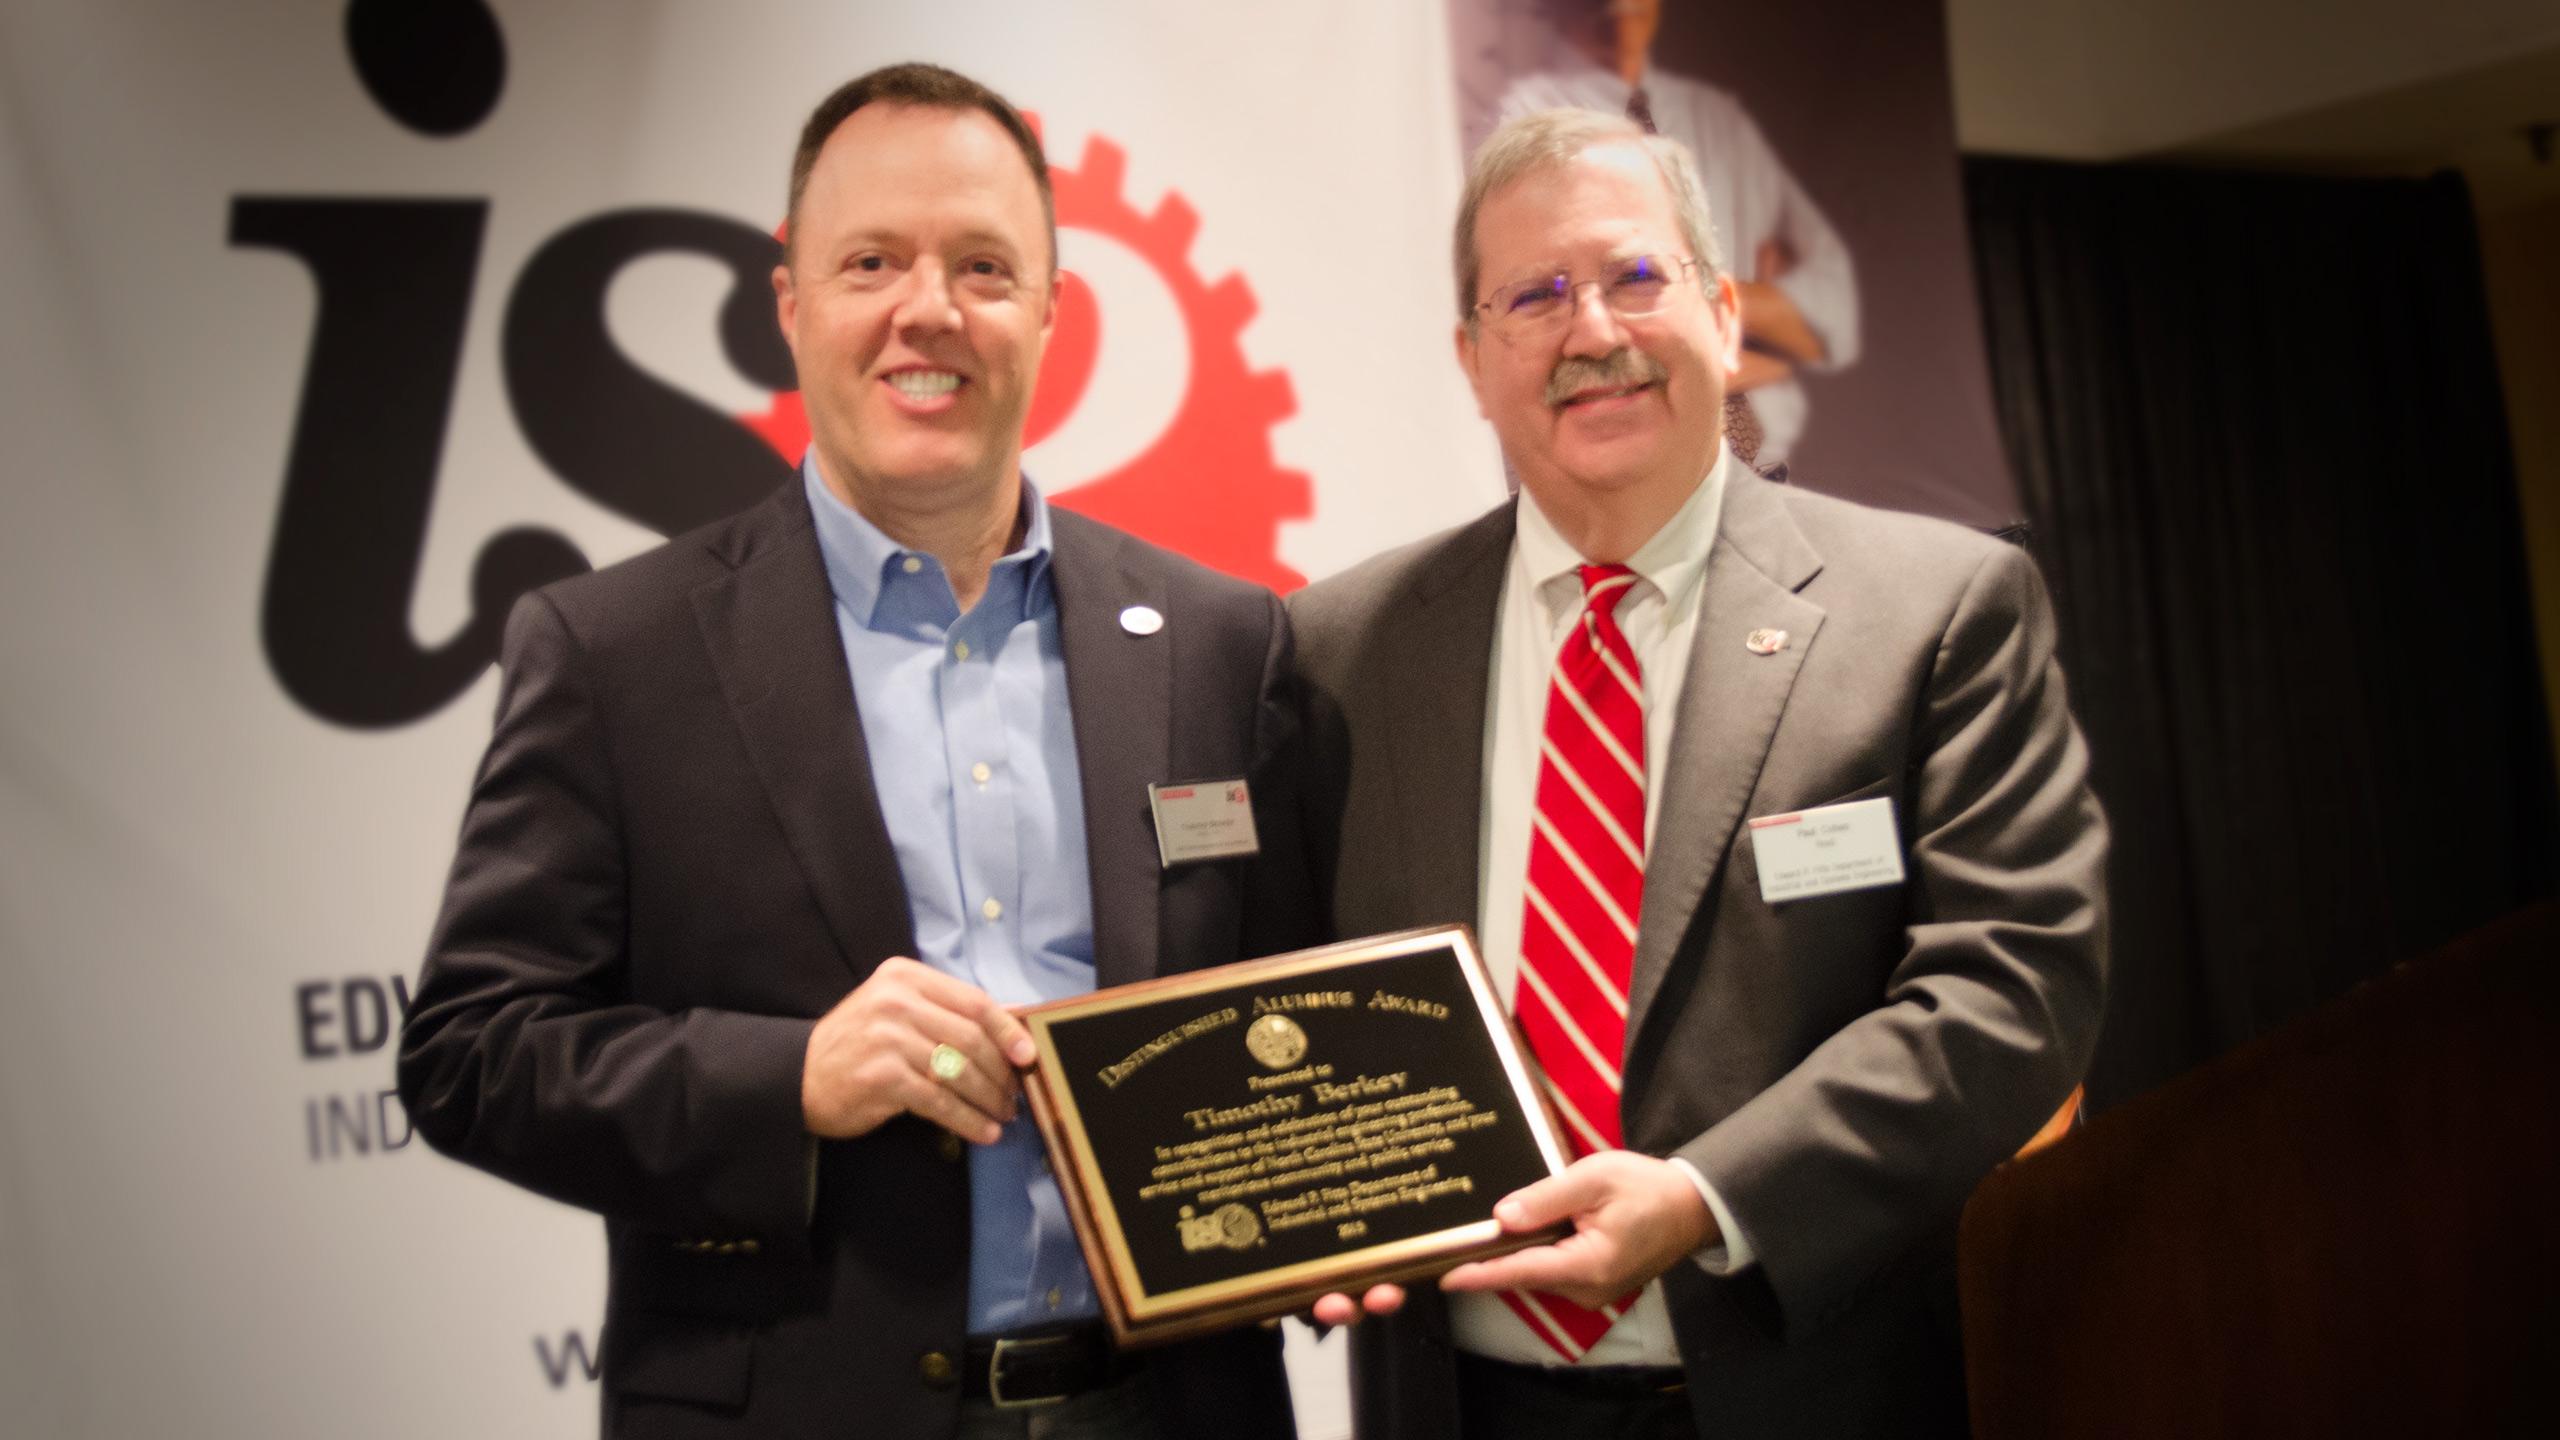 Distinguished Alumnus Award Turns 10